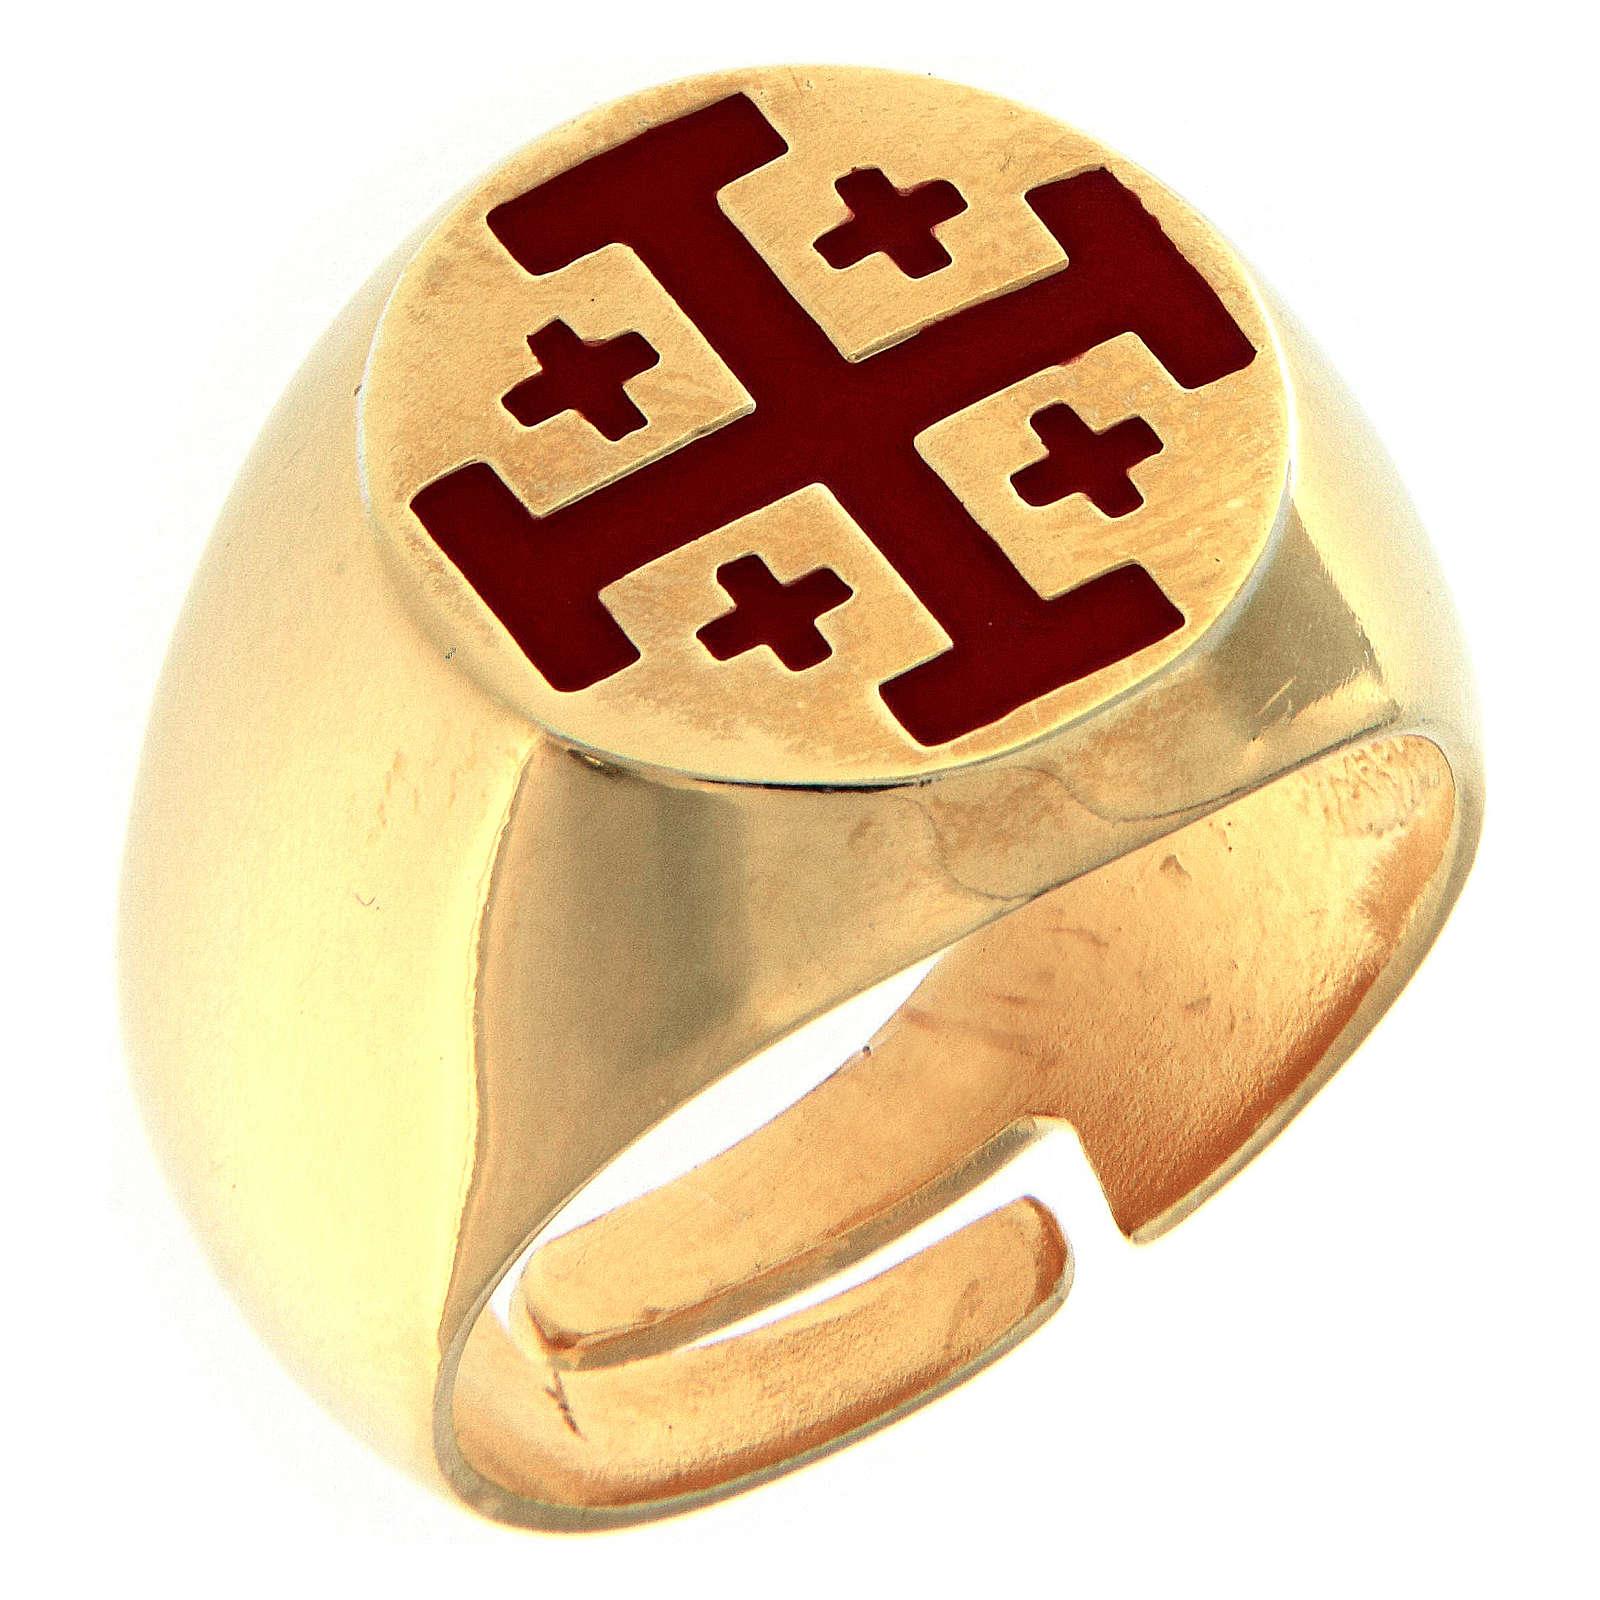 Bishop's ring, golden 925 silver with Jerusalem cross 3